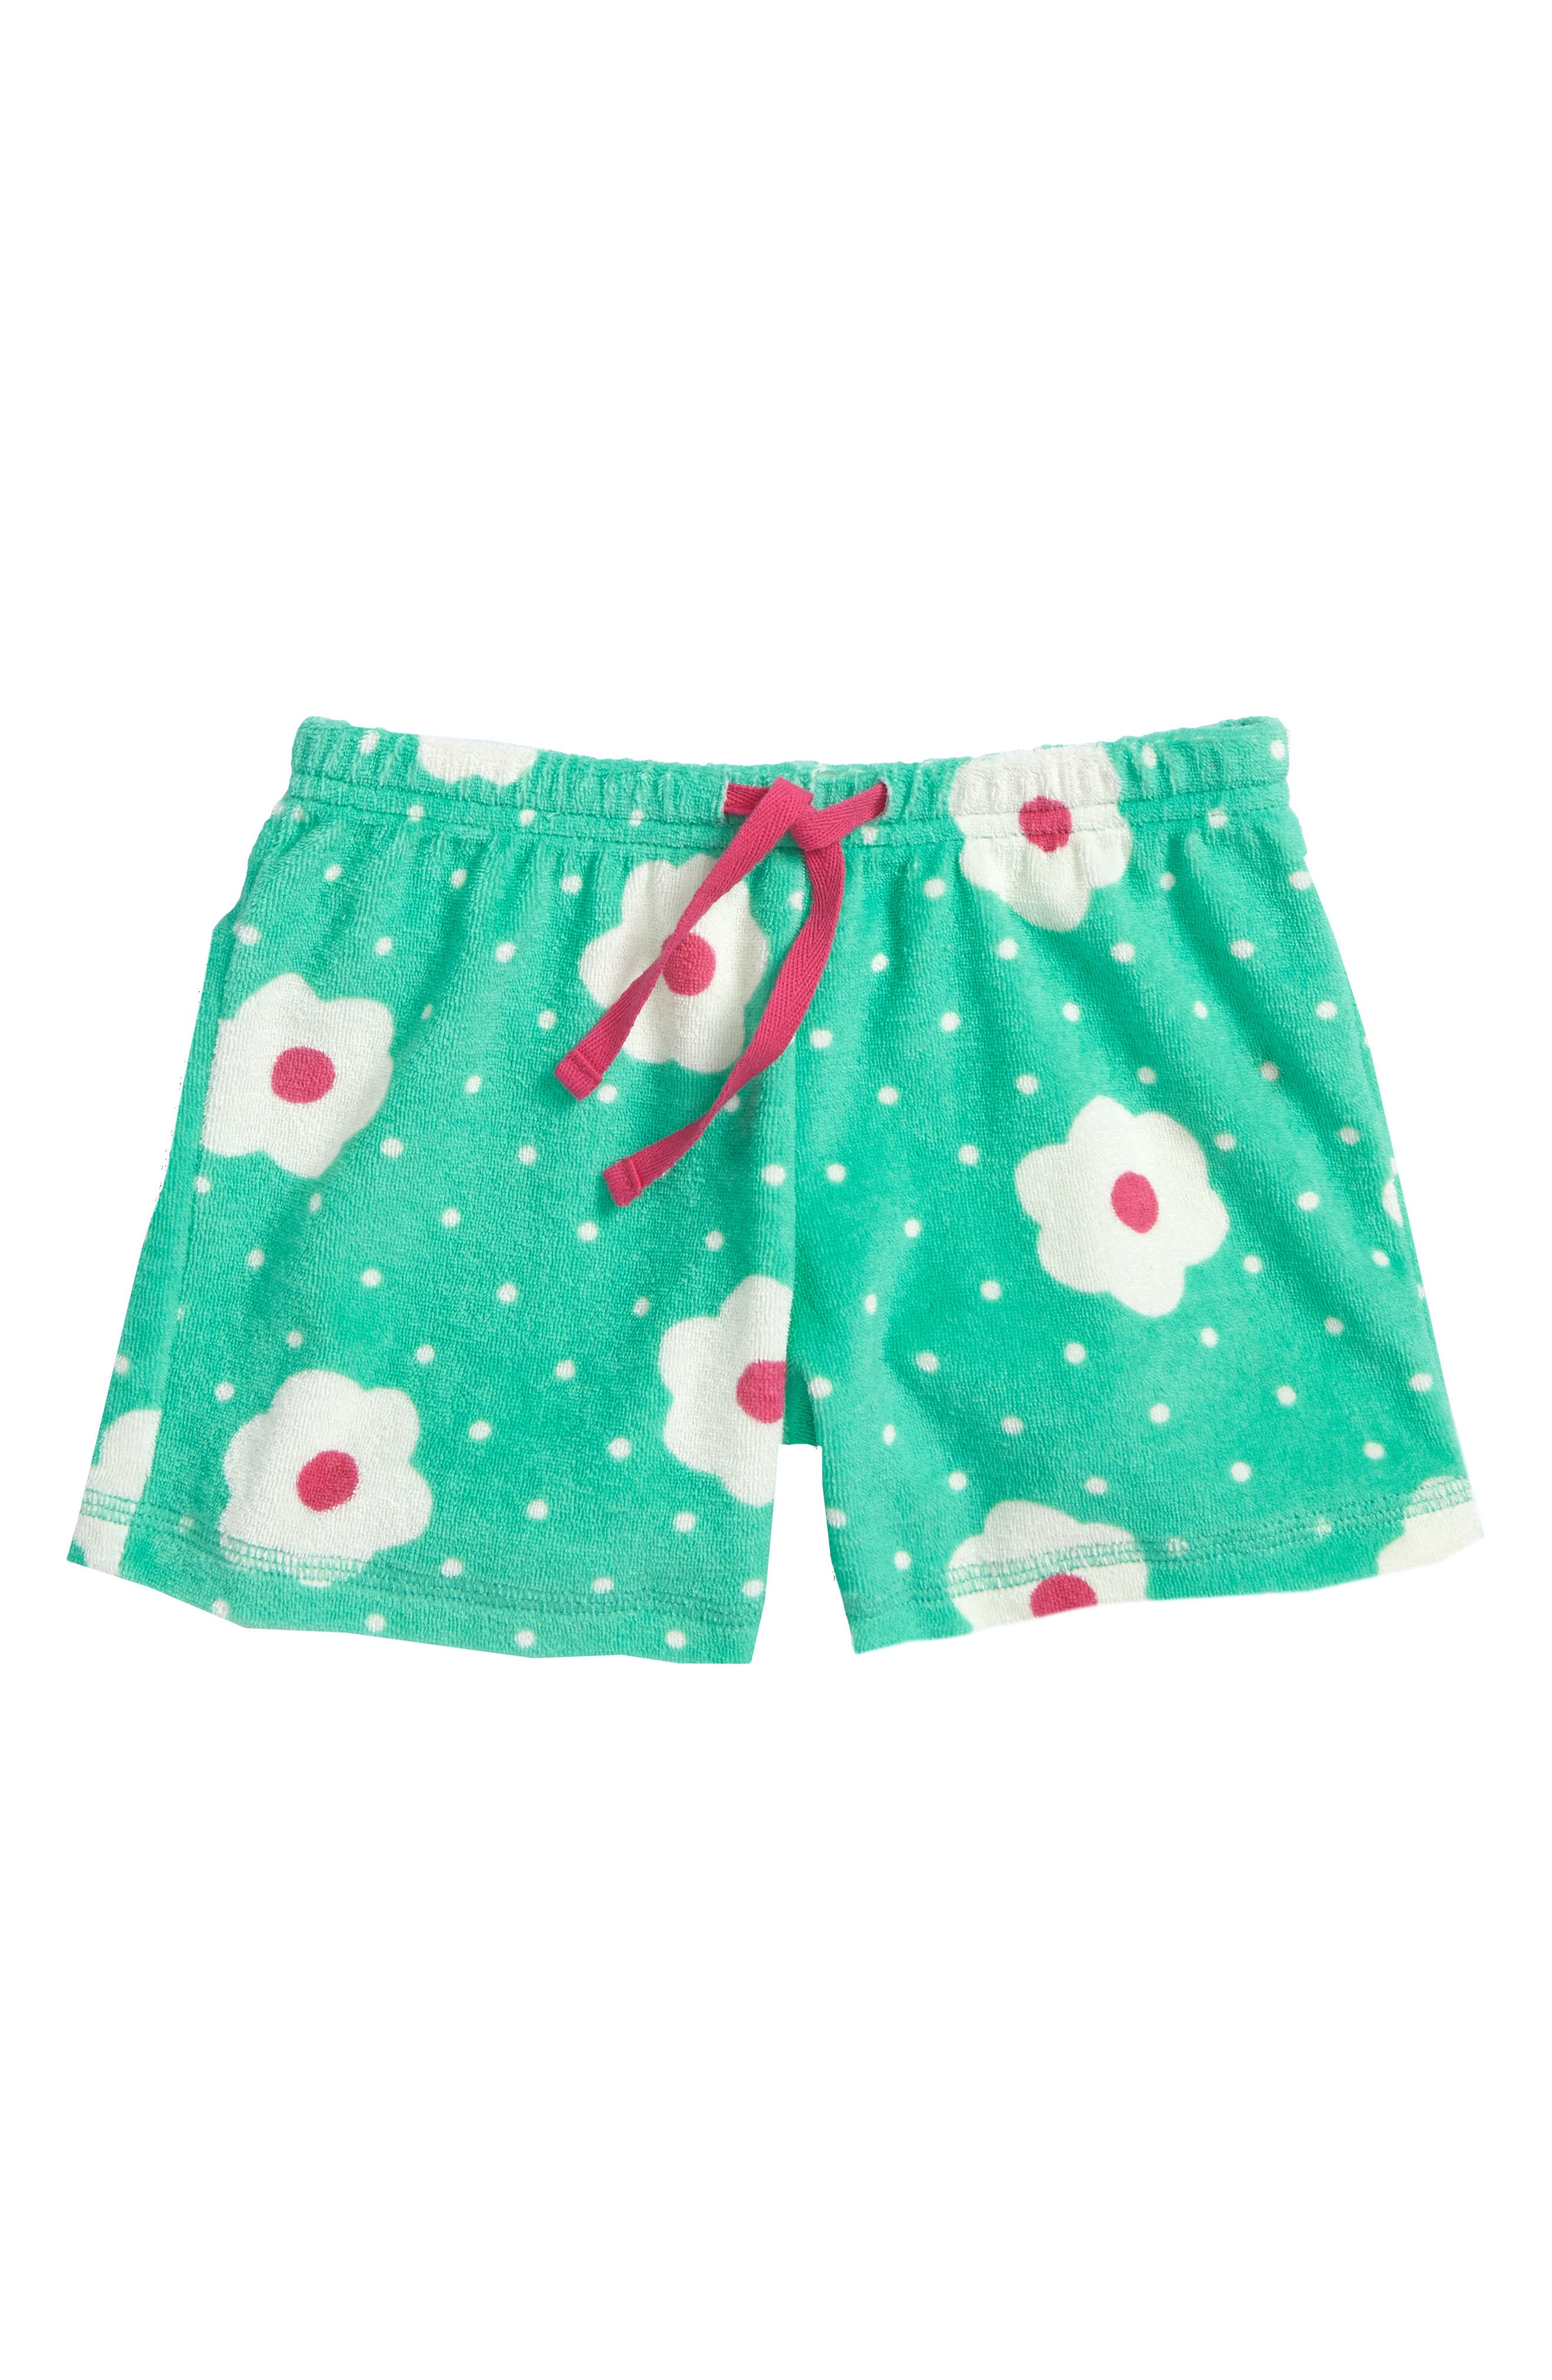 Adventure Toweling Shorts,                             Main thumbnail 1, color,